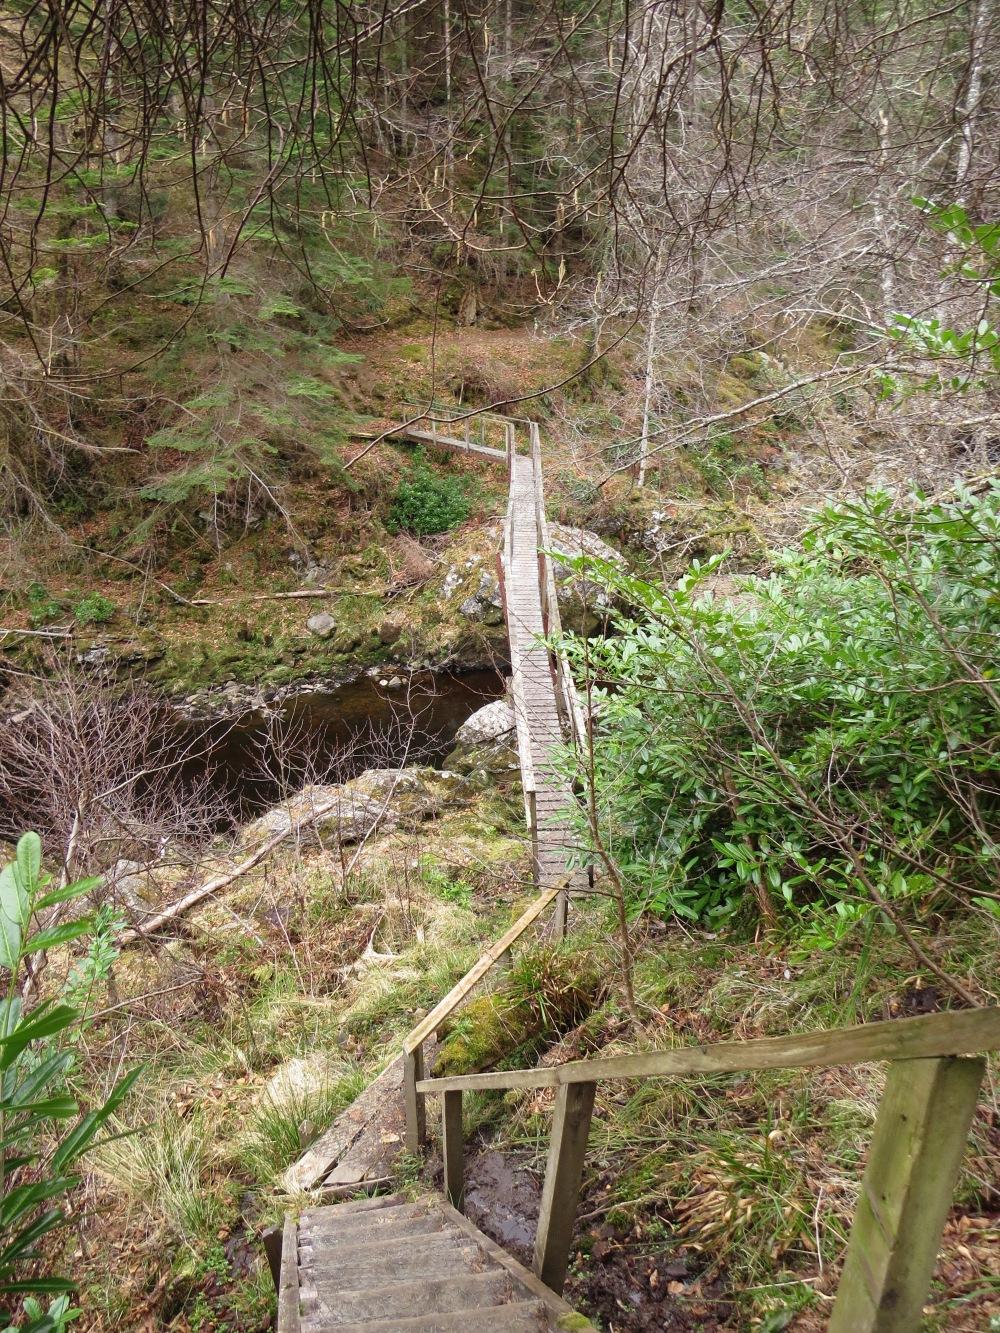 The rickety toothpick bridge!